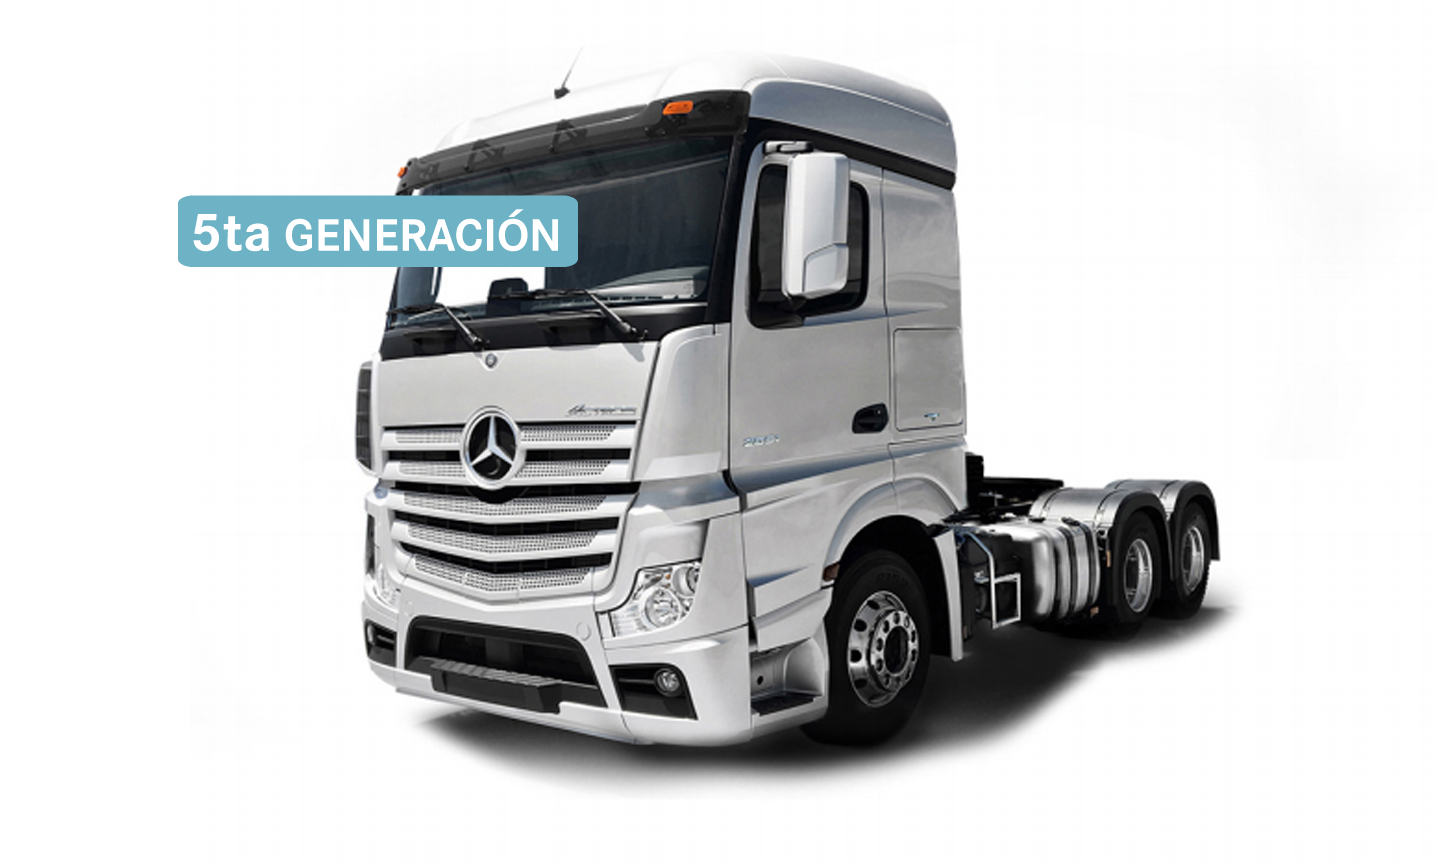 New Actros 2651LS - 5ta Generación